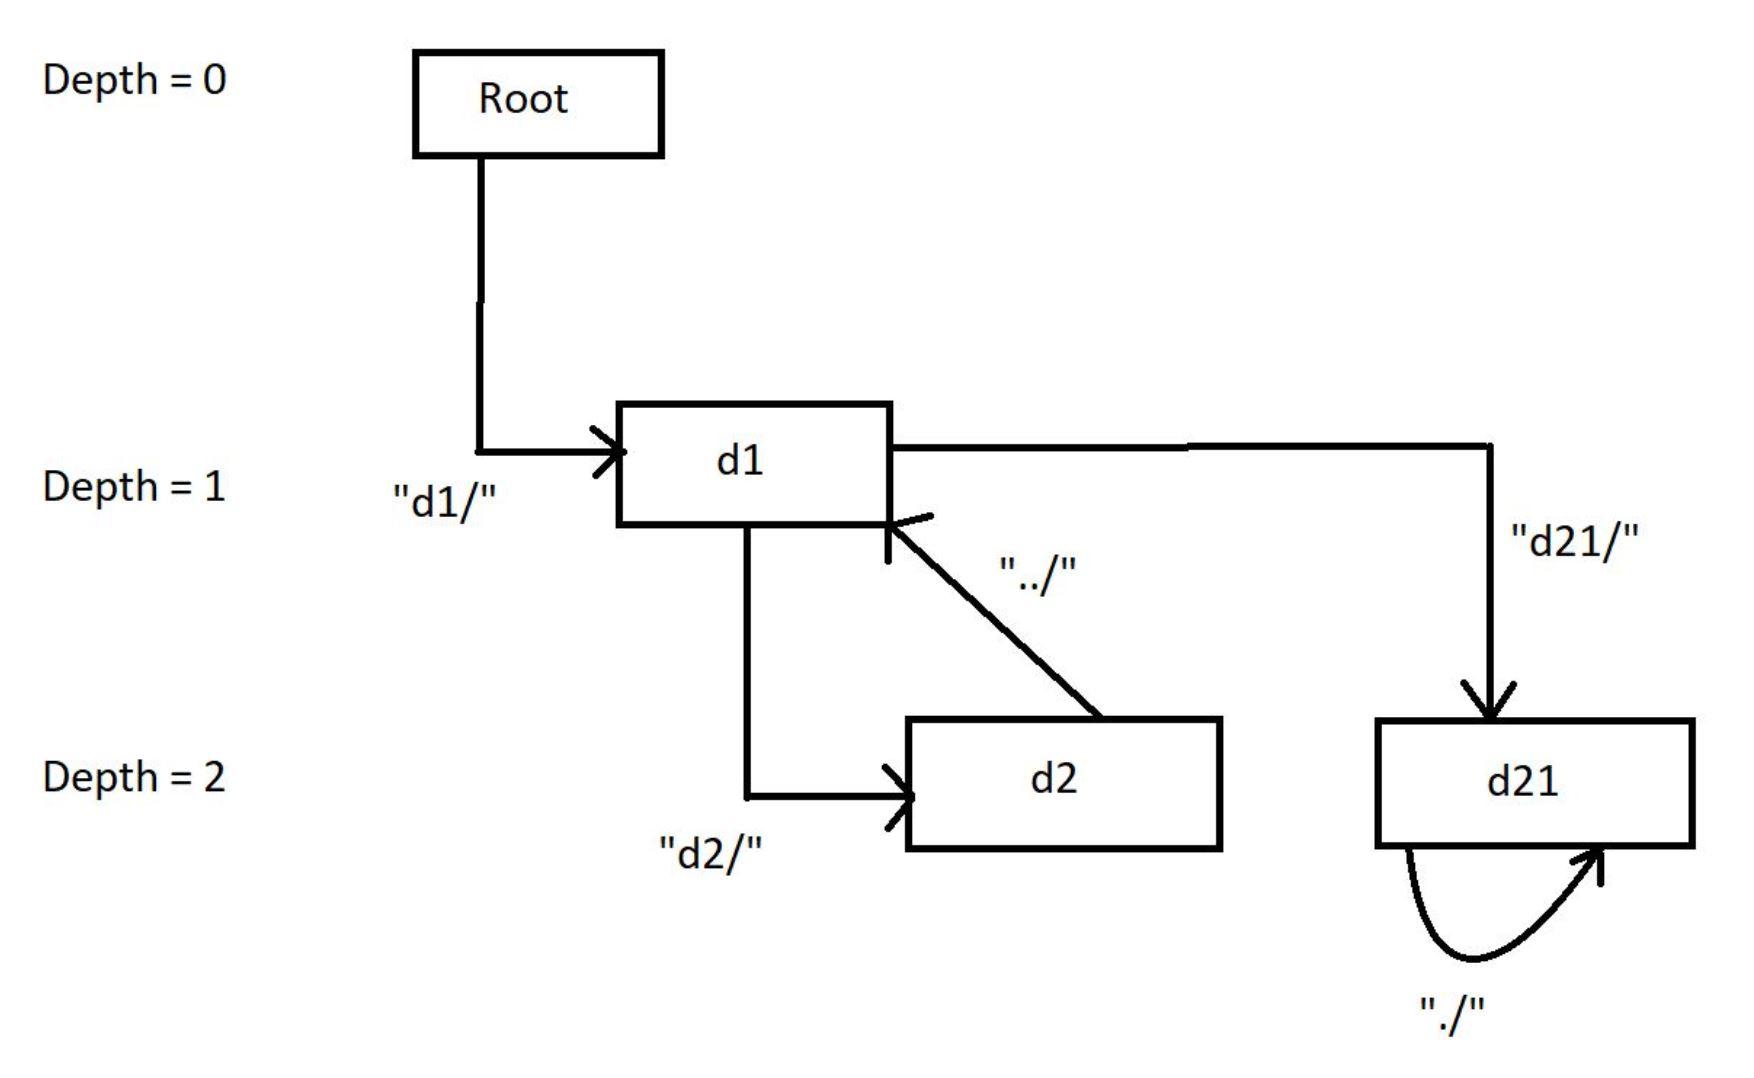 क्रॉलर लॉग फ़ोल्डर Leetcode समाधान